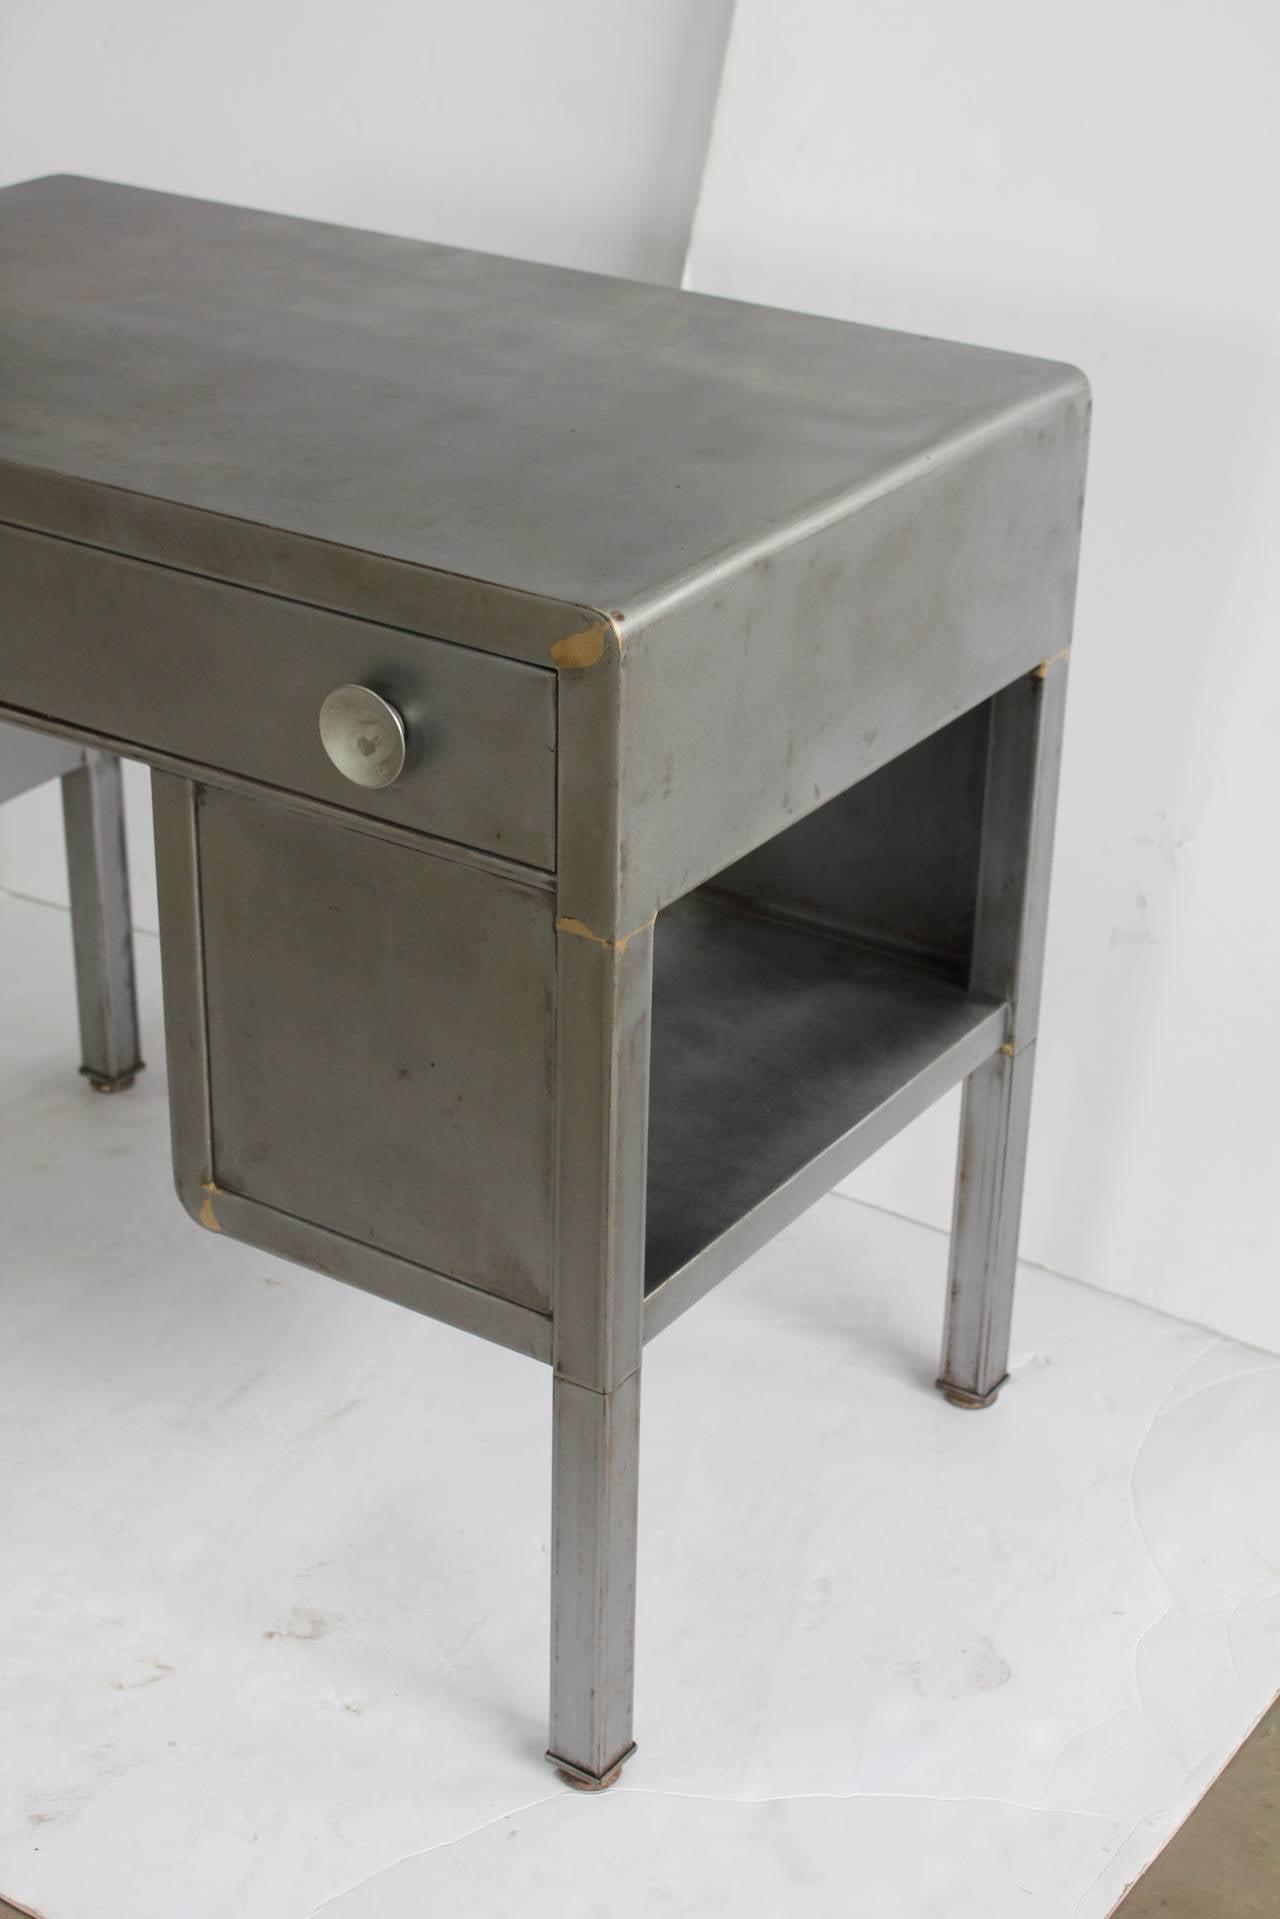 Vintage Industrial Metal Desk by Norman Bel Geddes at 1stdibs